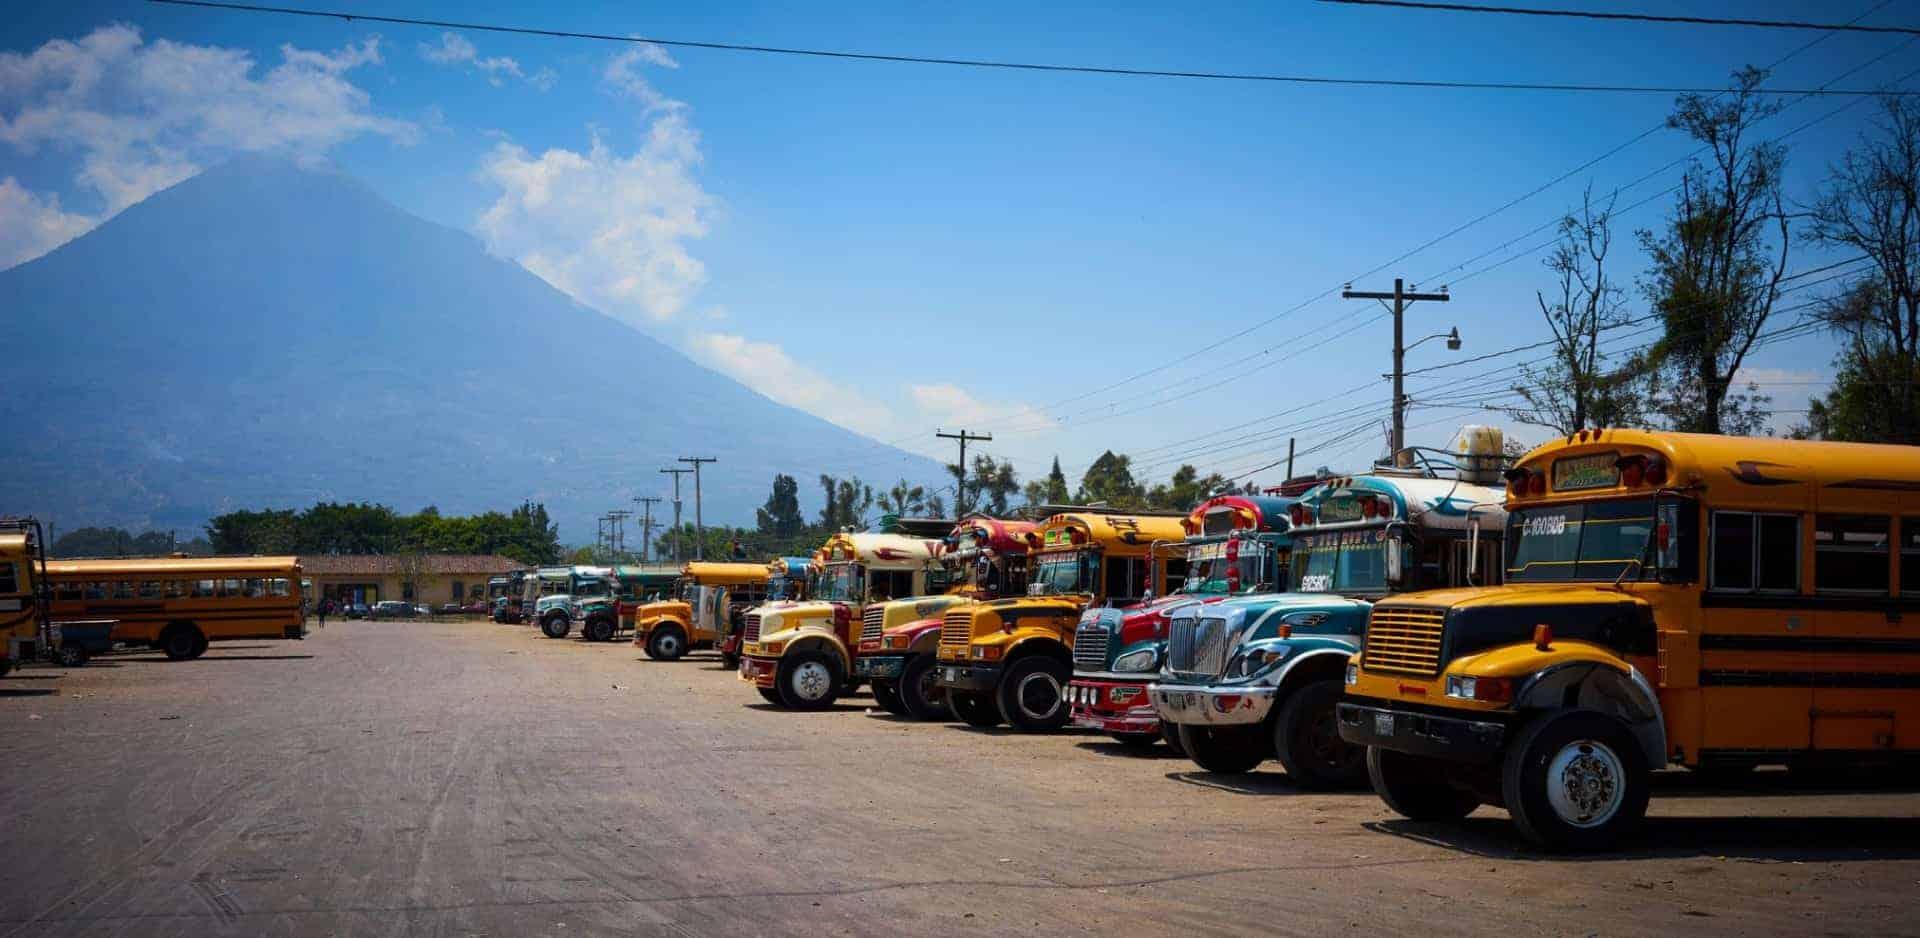 Colourful chicken buses in Antigua Guatemala